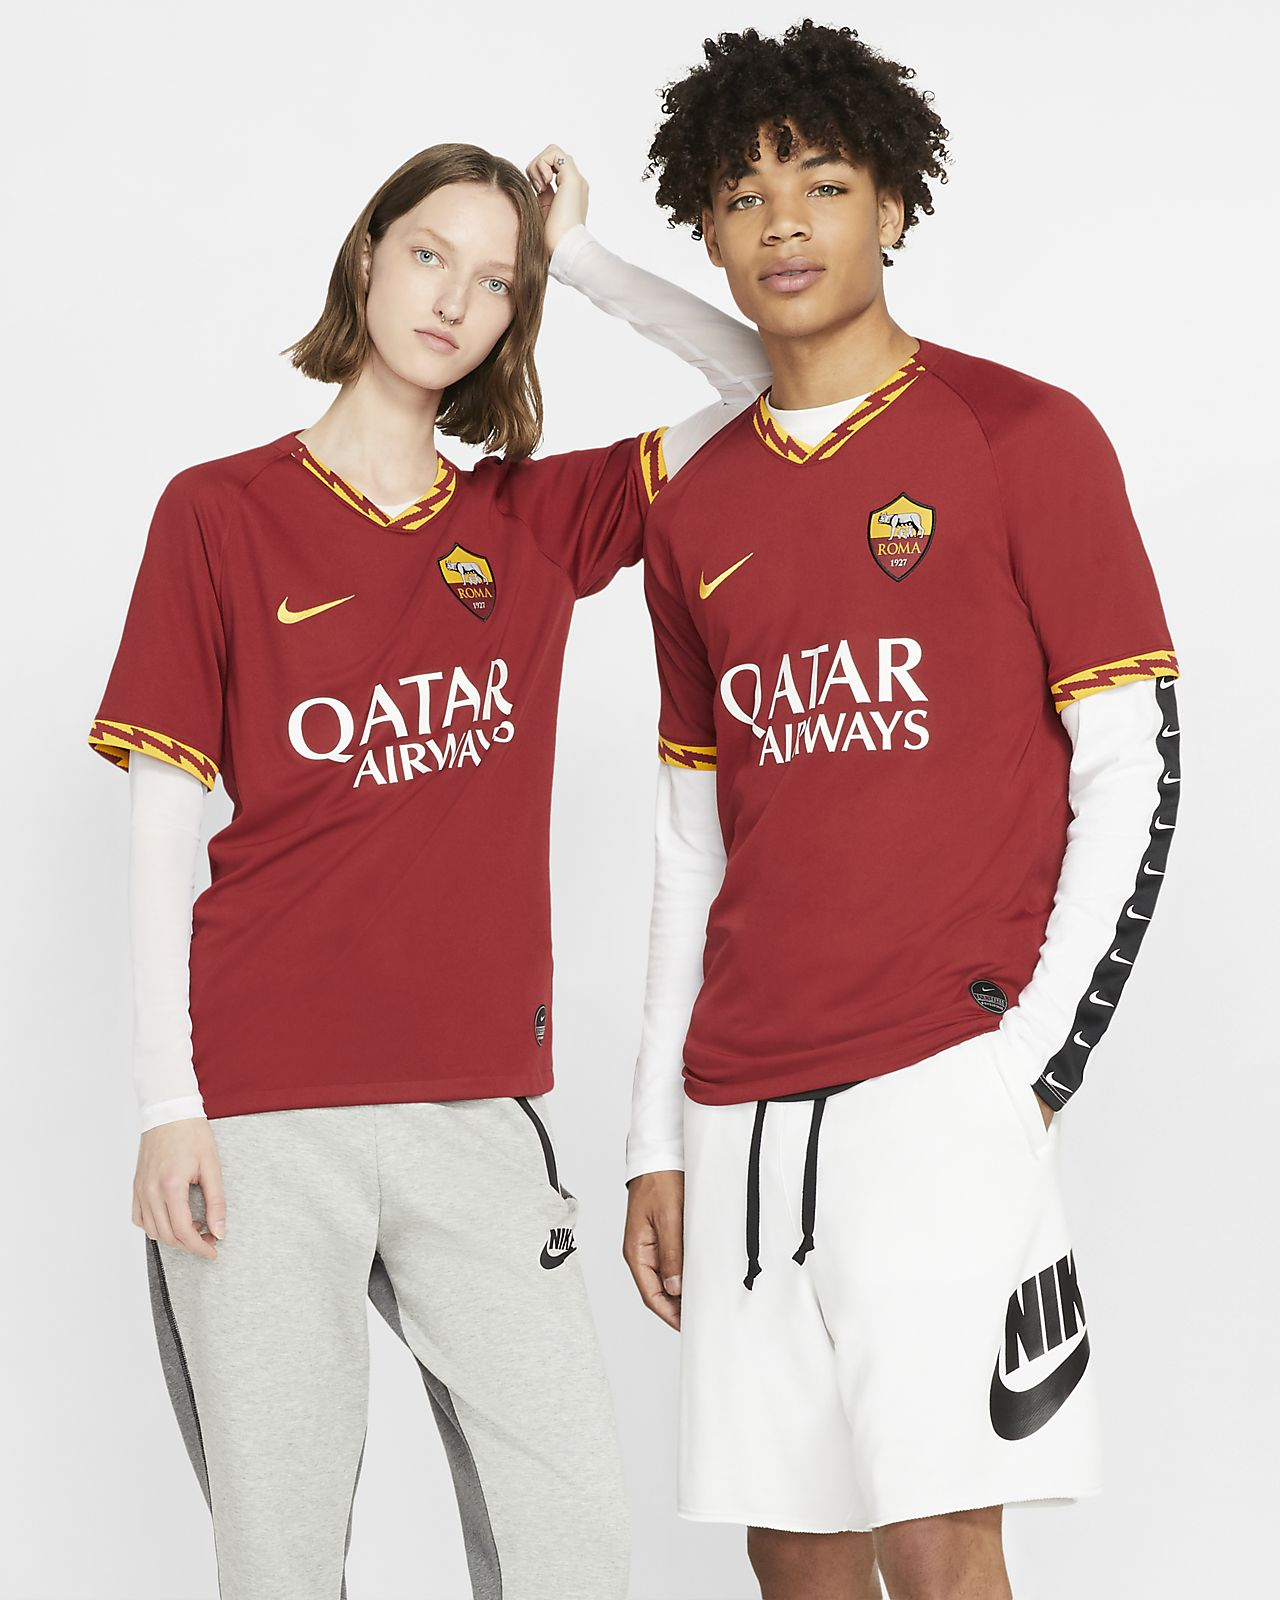 A.S. Roma 2019/20 Stadium Home Fußballtrikot